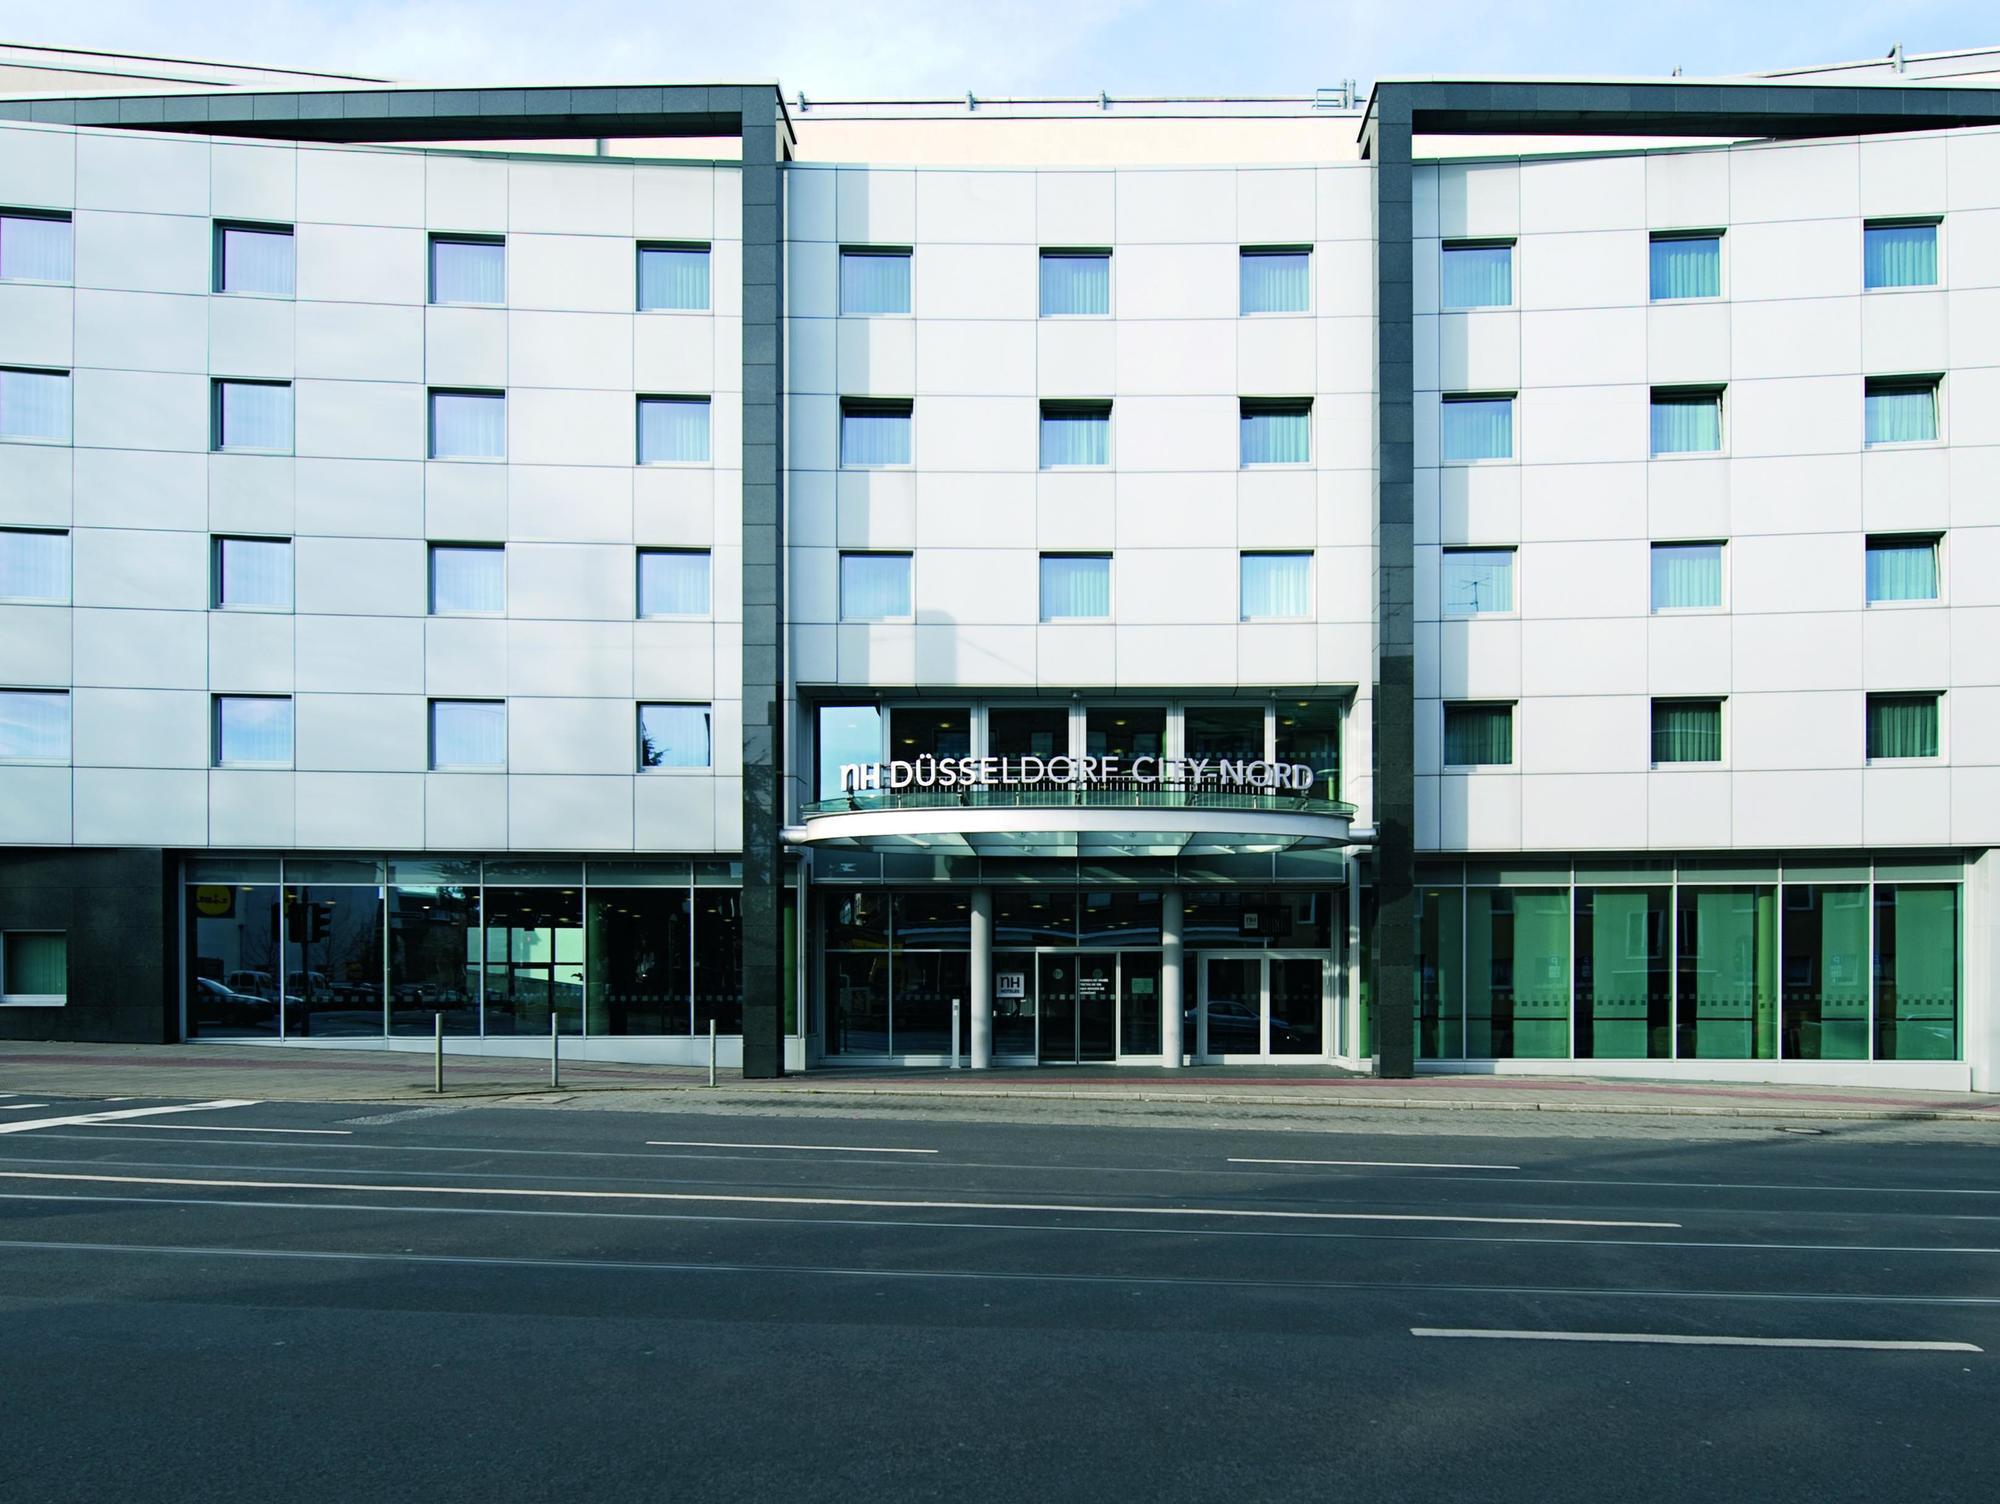 Hotel nh duesseldorf city nord, dÜsseldorf ****